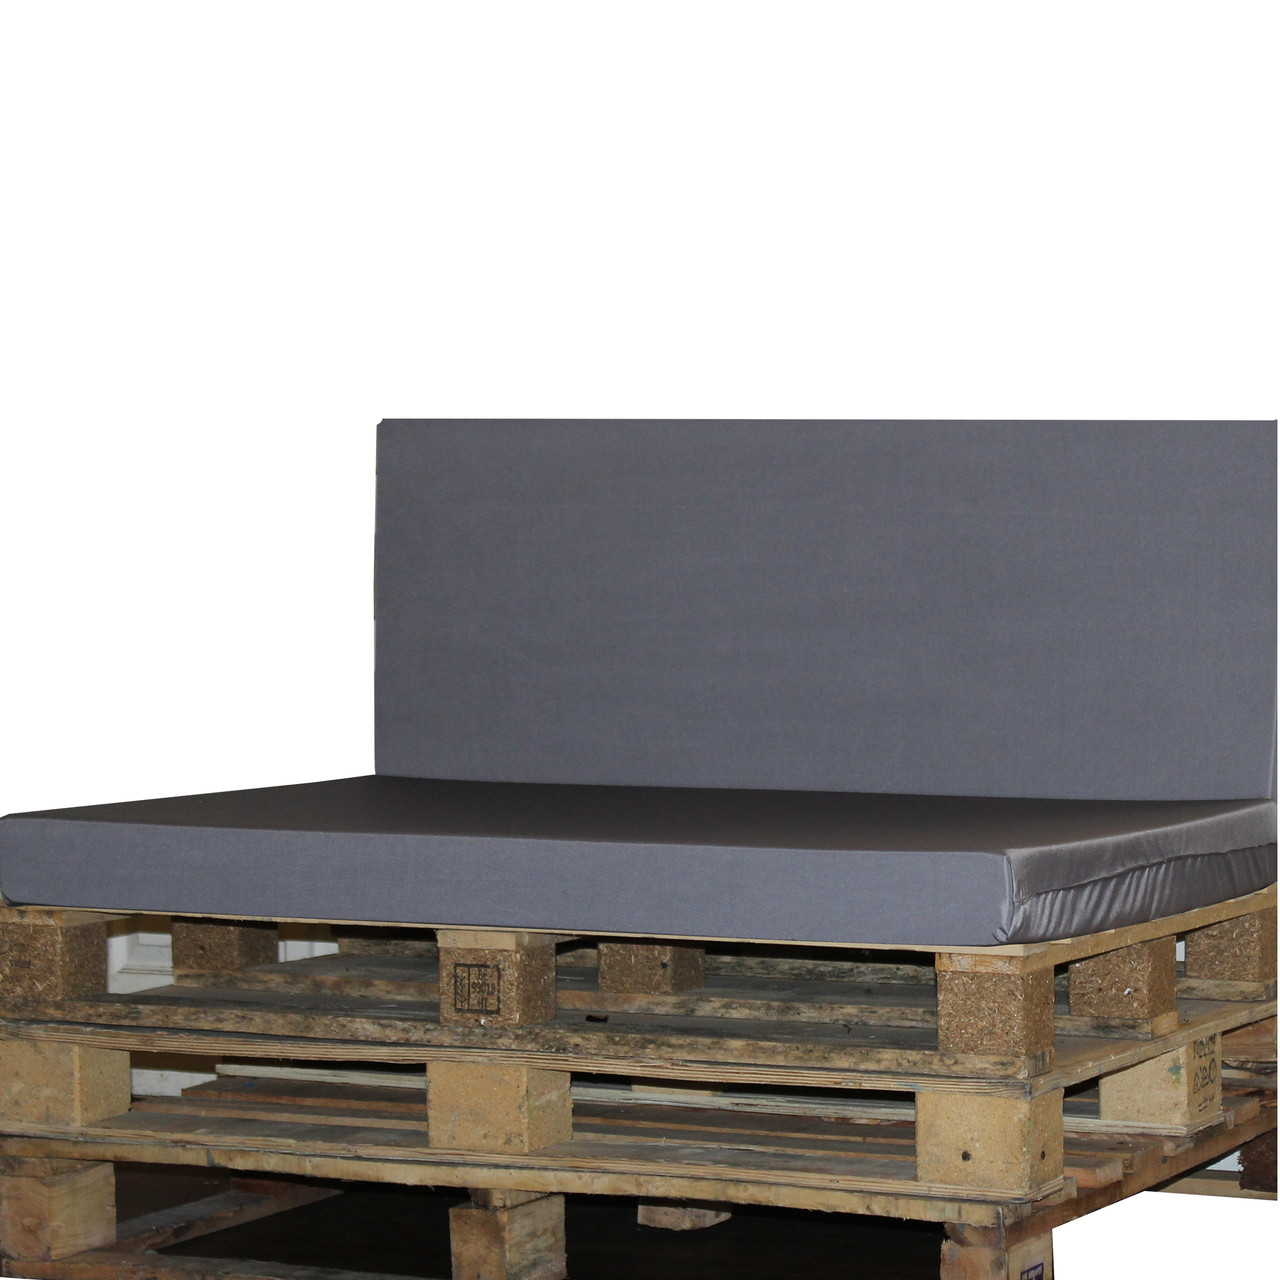 Kosipad Grey foam cushion pads seating Cushions for Euro Pallets